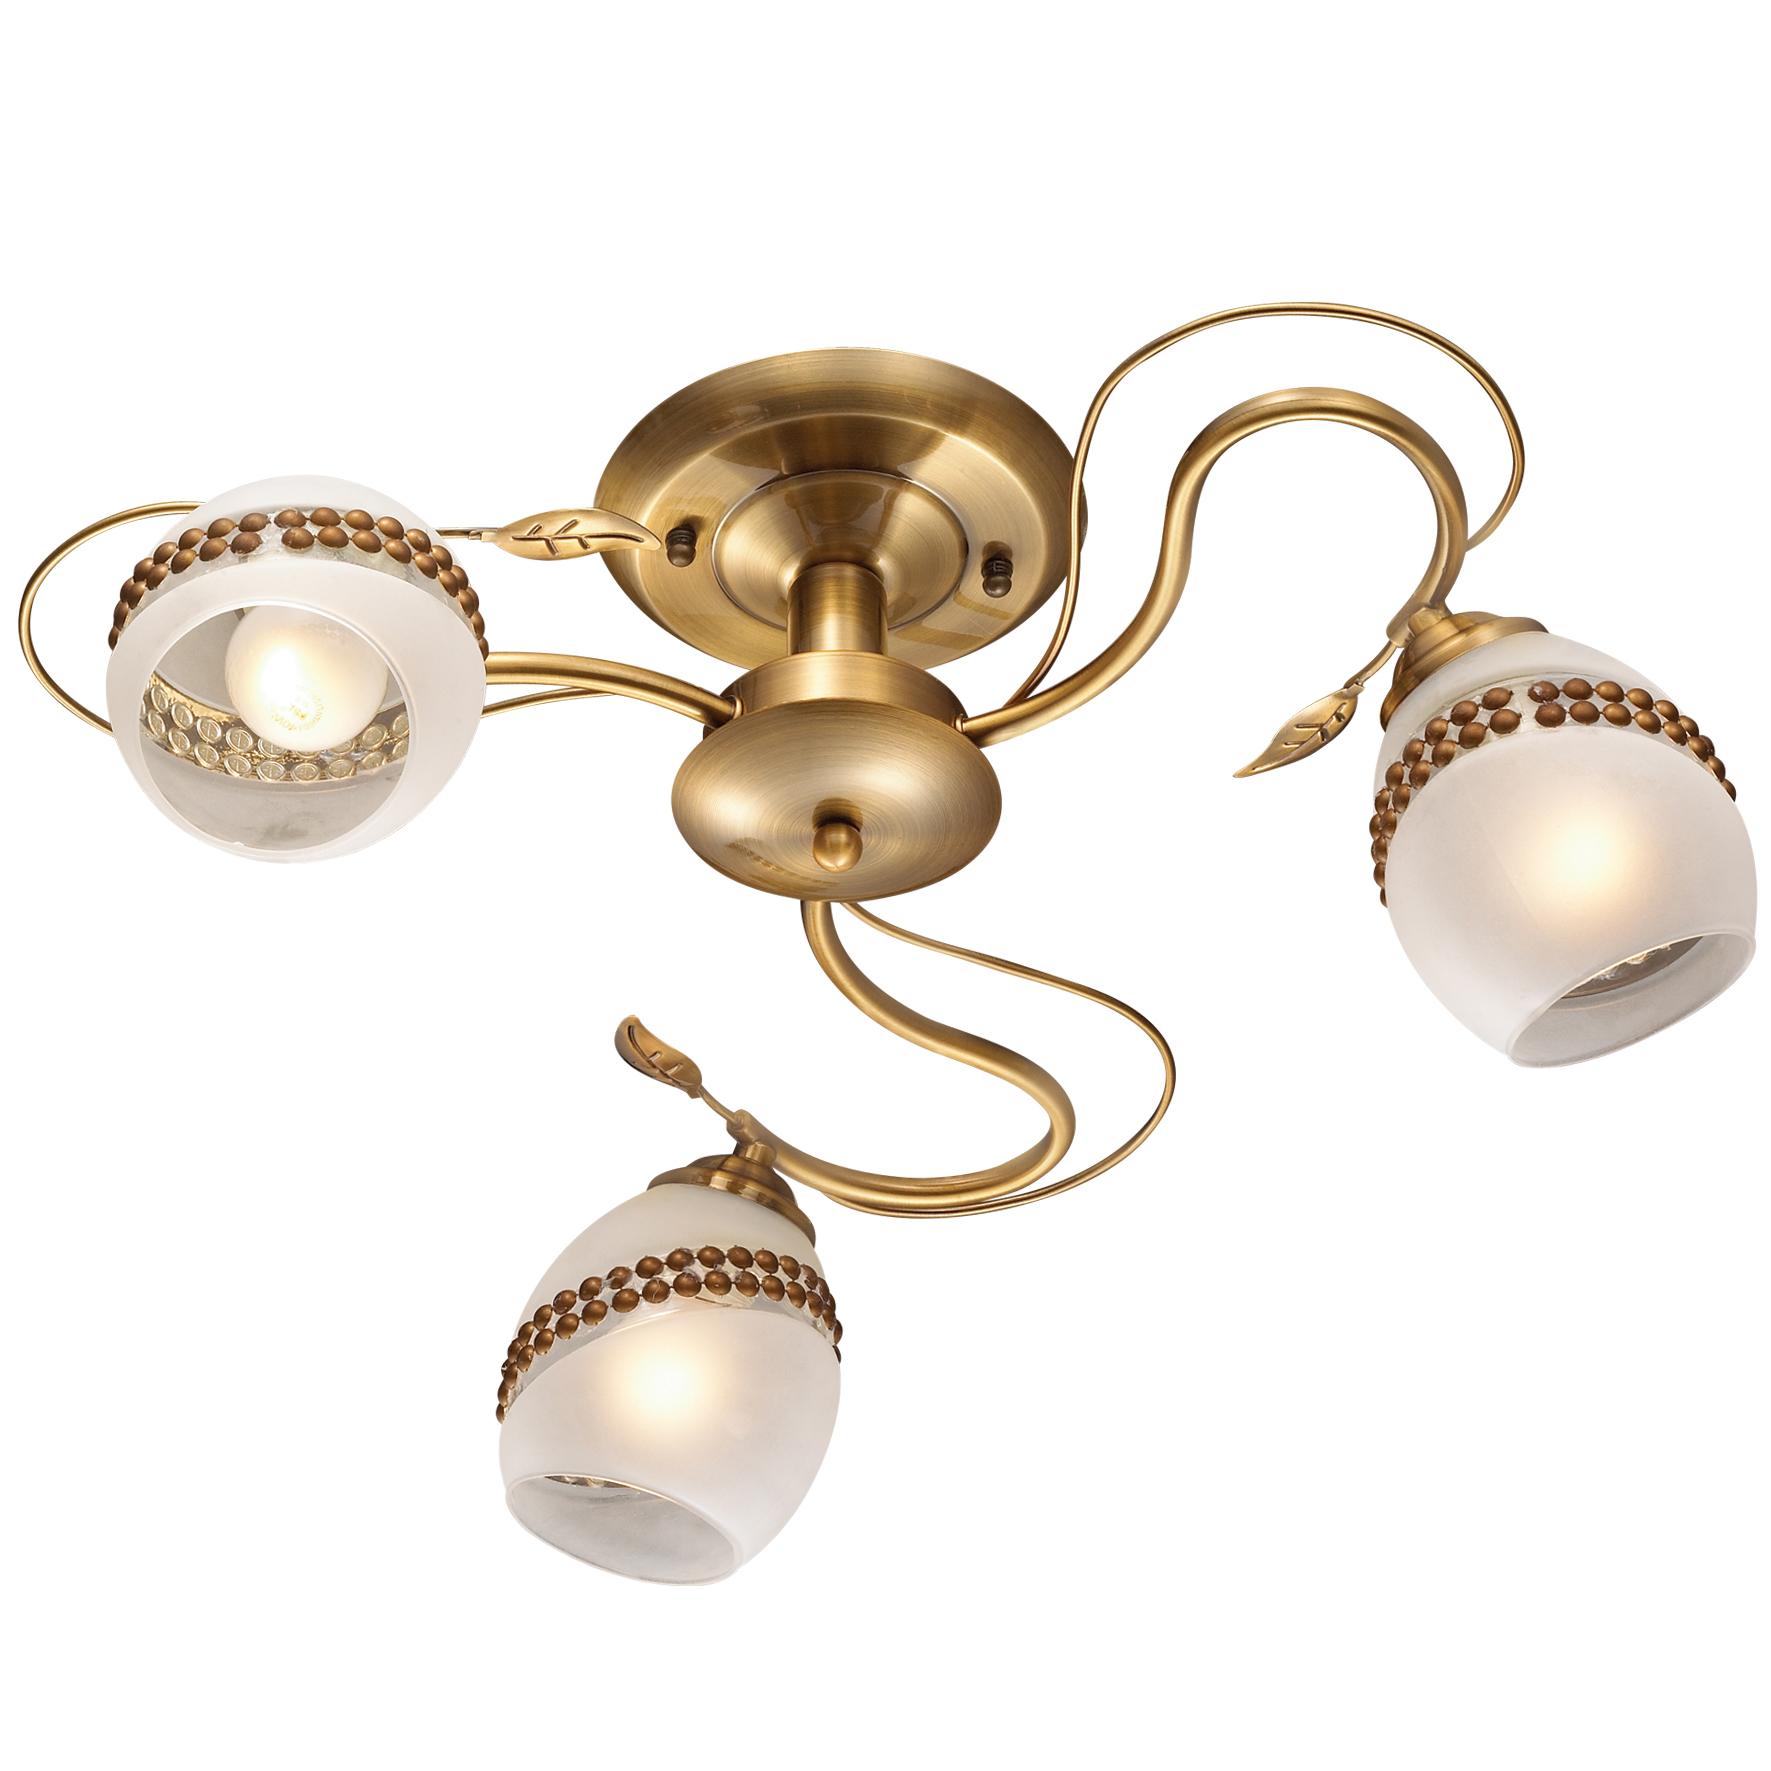 Люстра Odeon light 2459/3 люстра l1011 3 jasmine 3х60вт е27 металл стекло